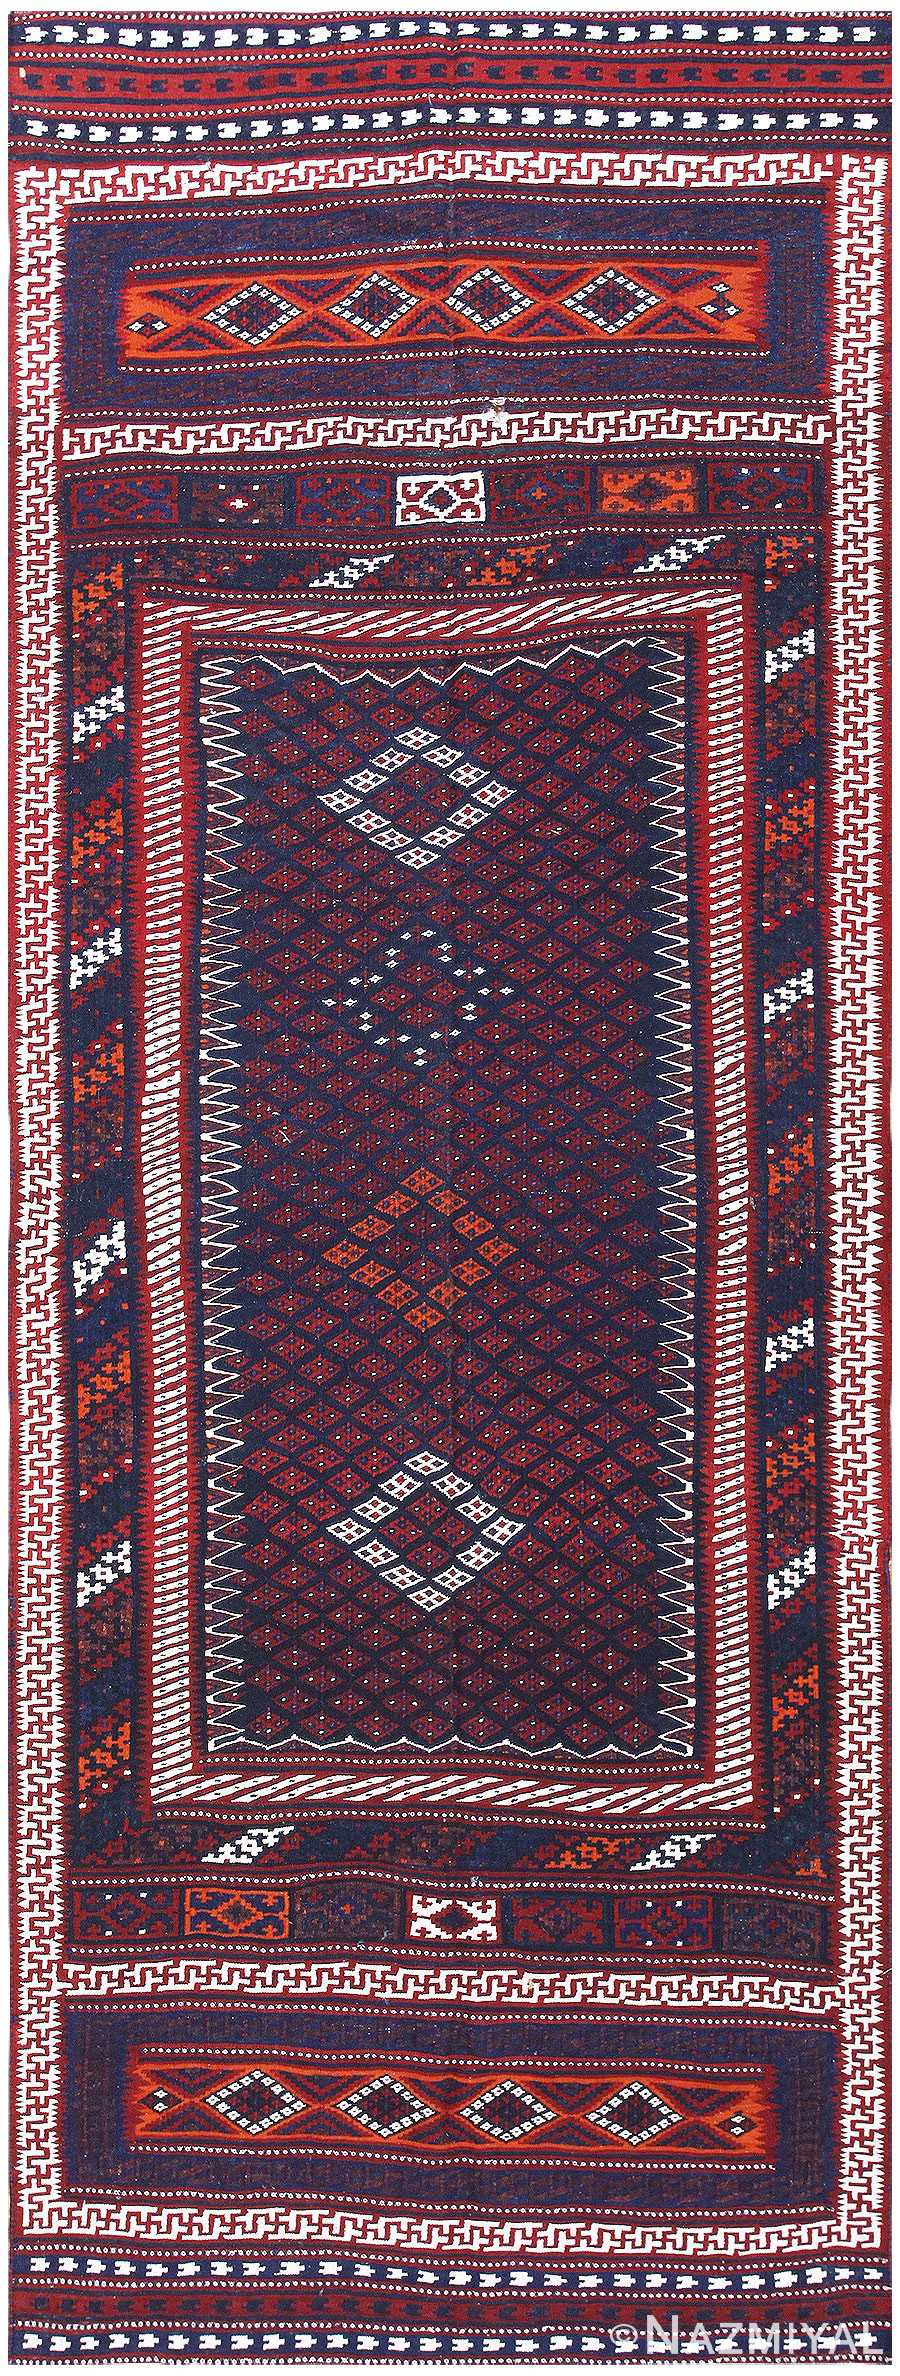 Antique Turkish Kilim 50168 Detail/Large View